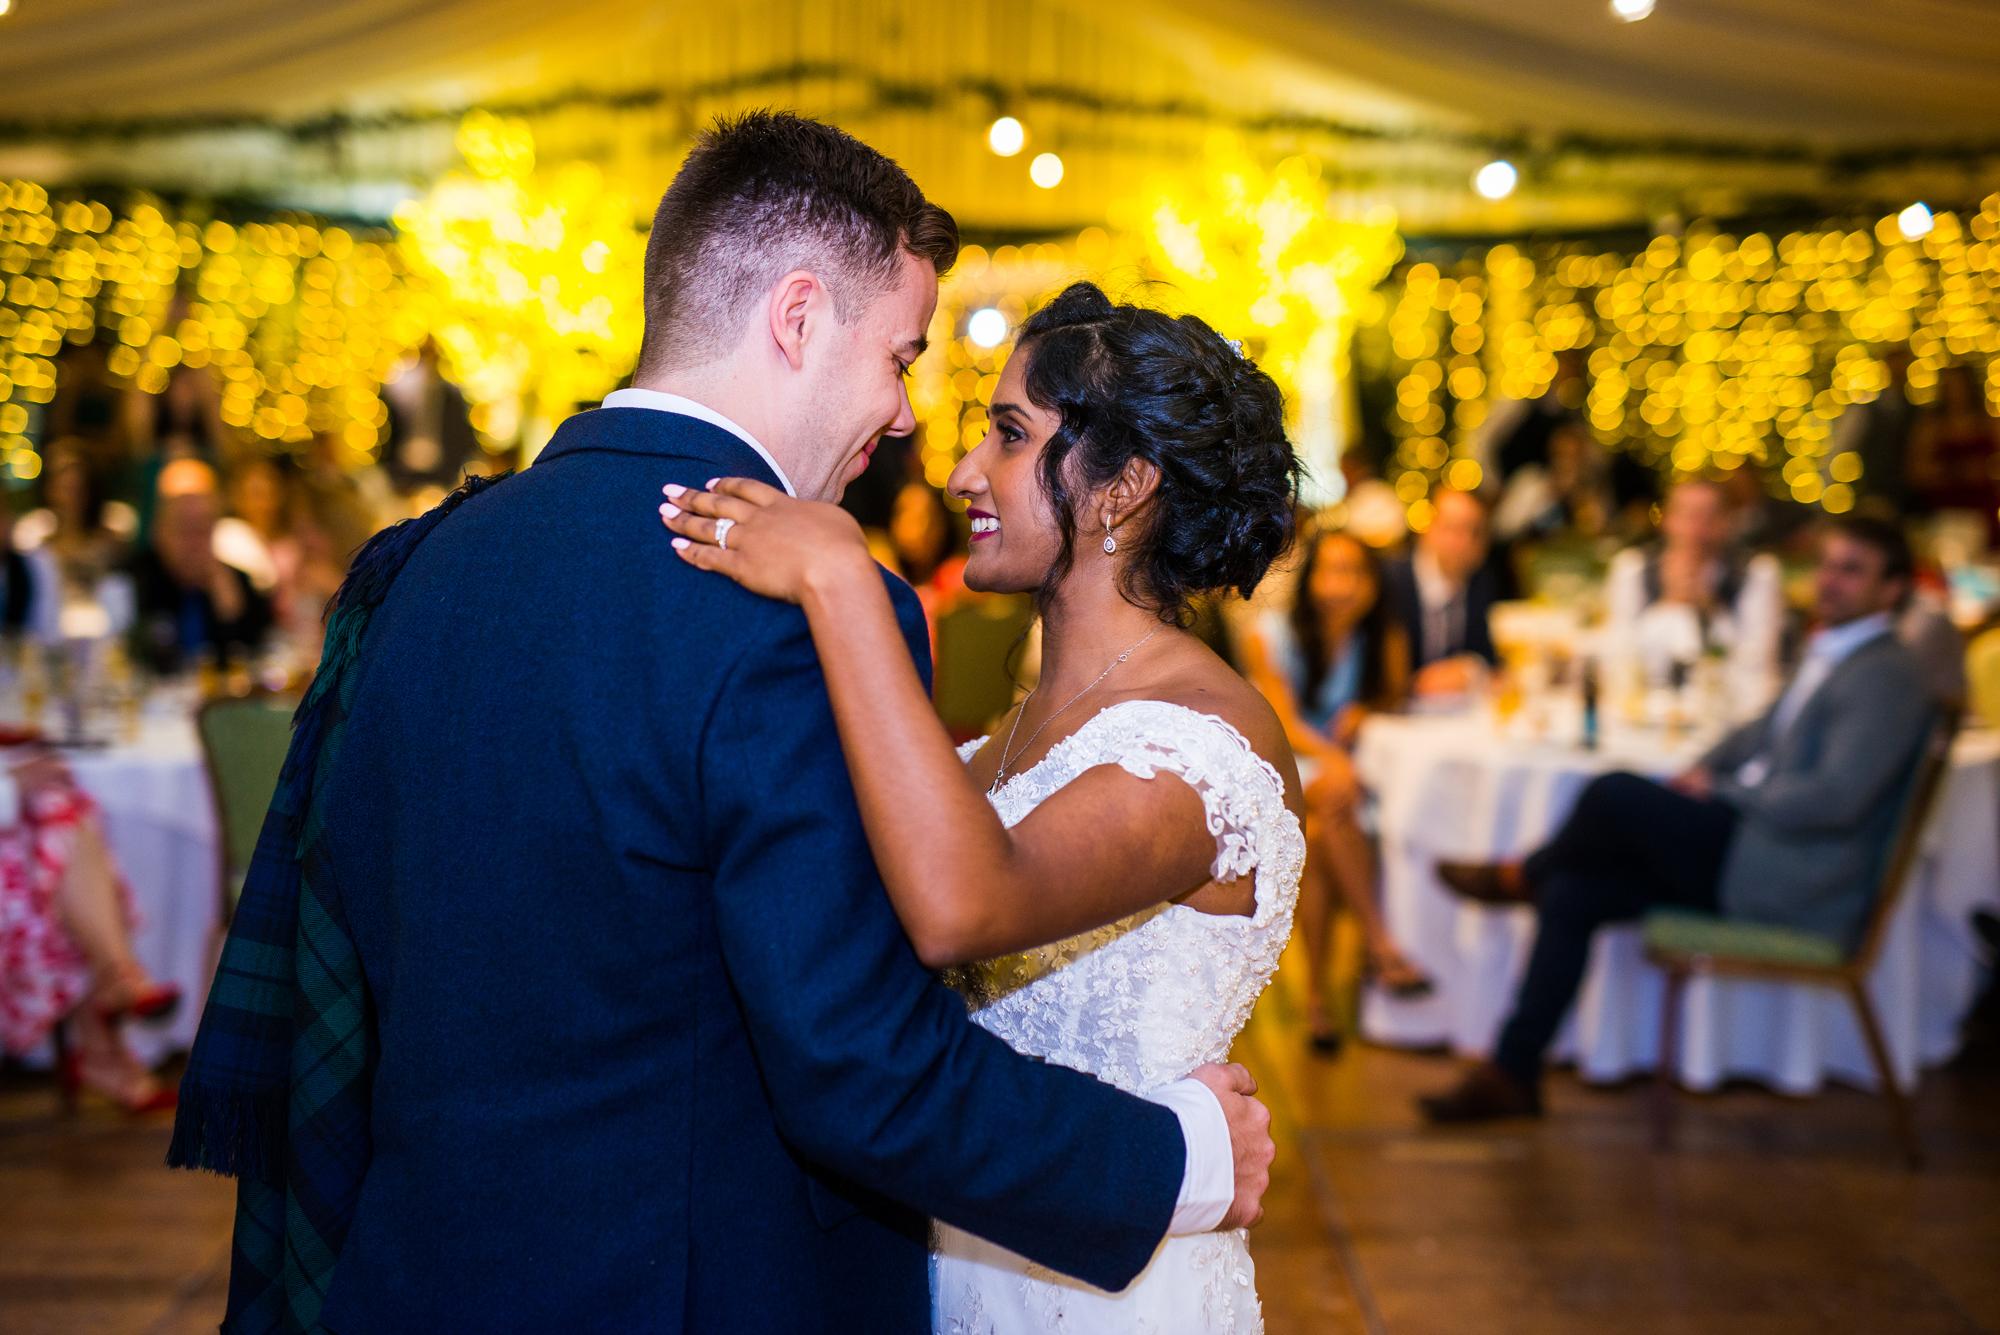 Kev and Shrabani wedding photos (323 of 350).jpg